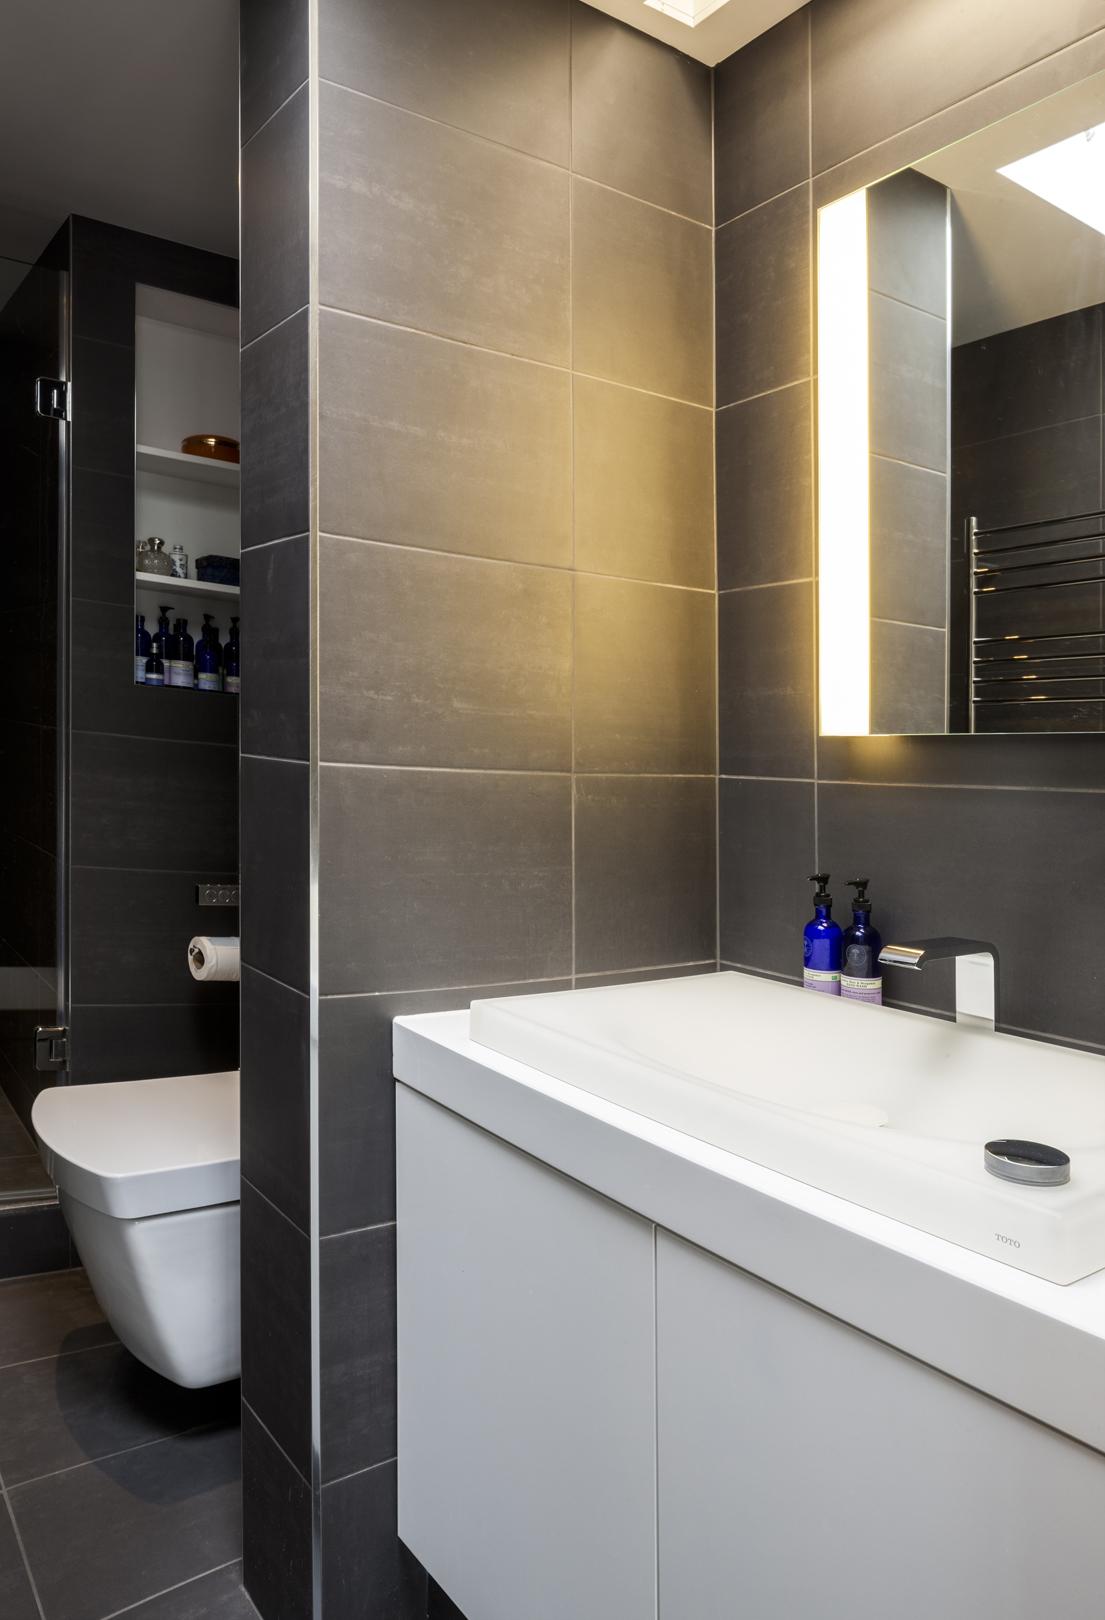 Bathroom brand toto brings luxury to grand designs inside id for Toto bathroom designs